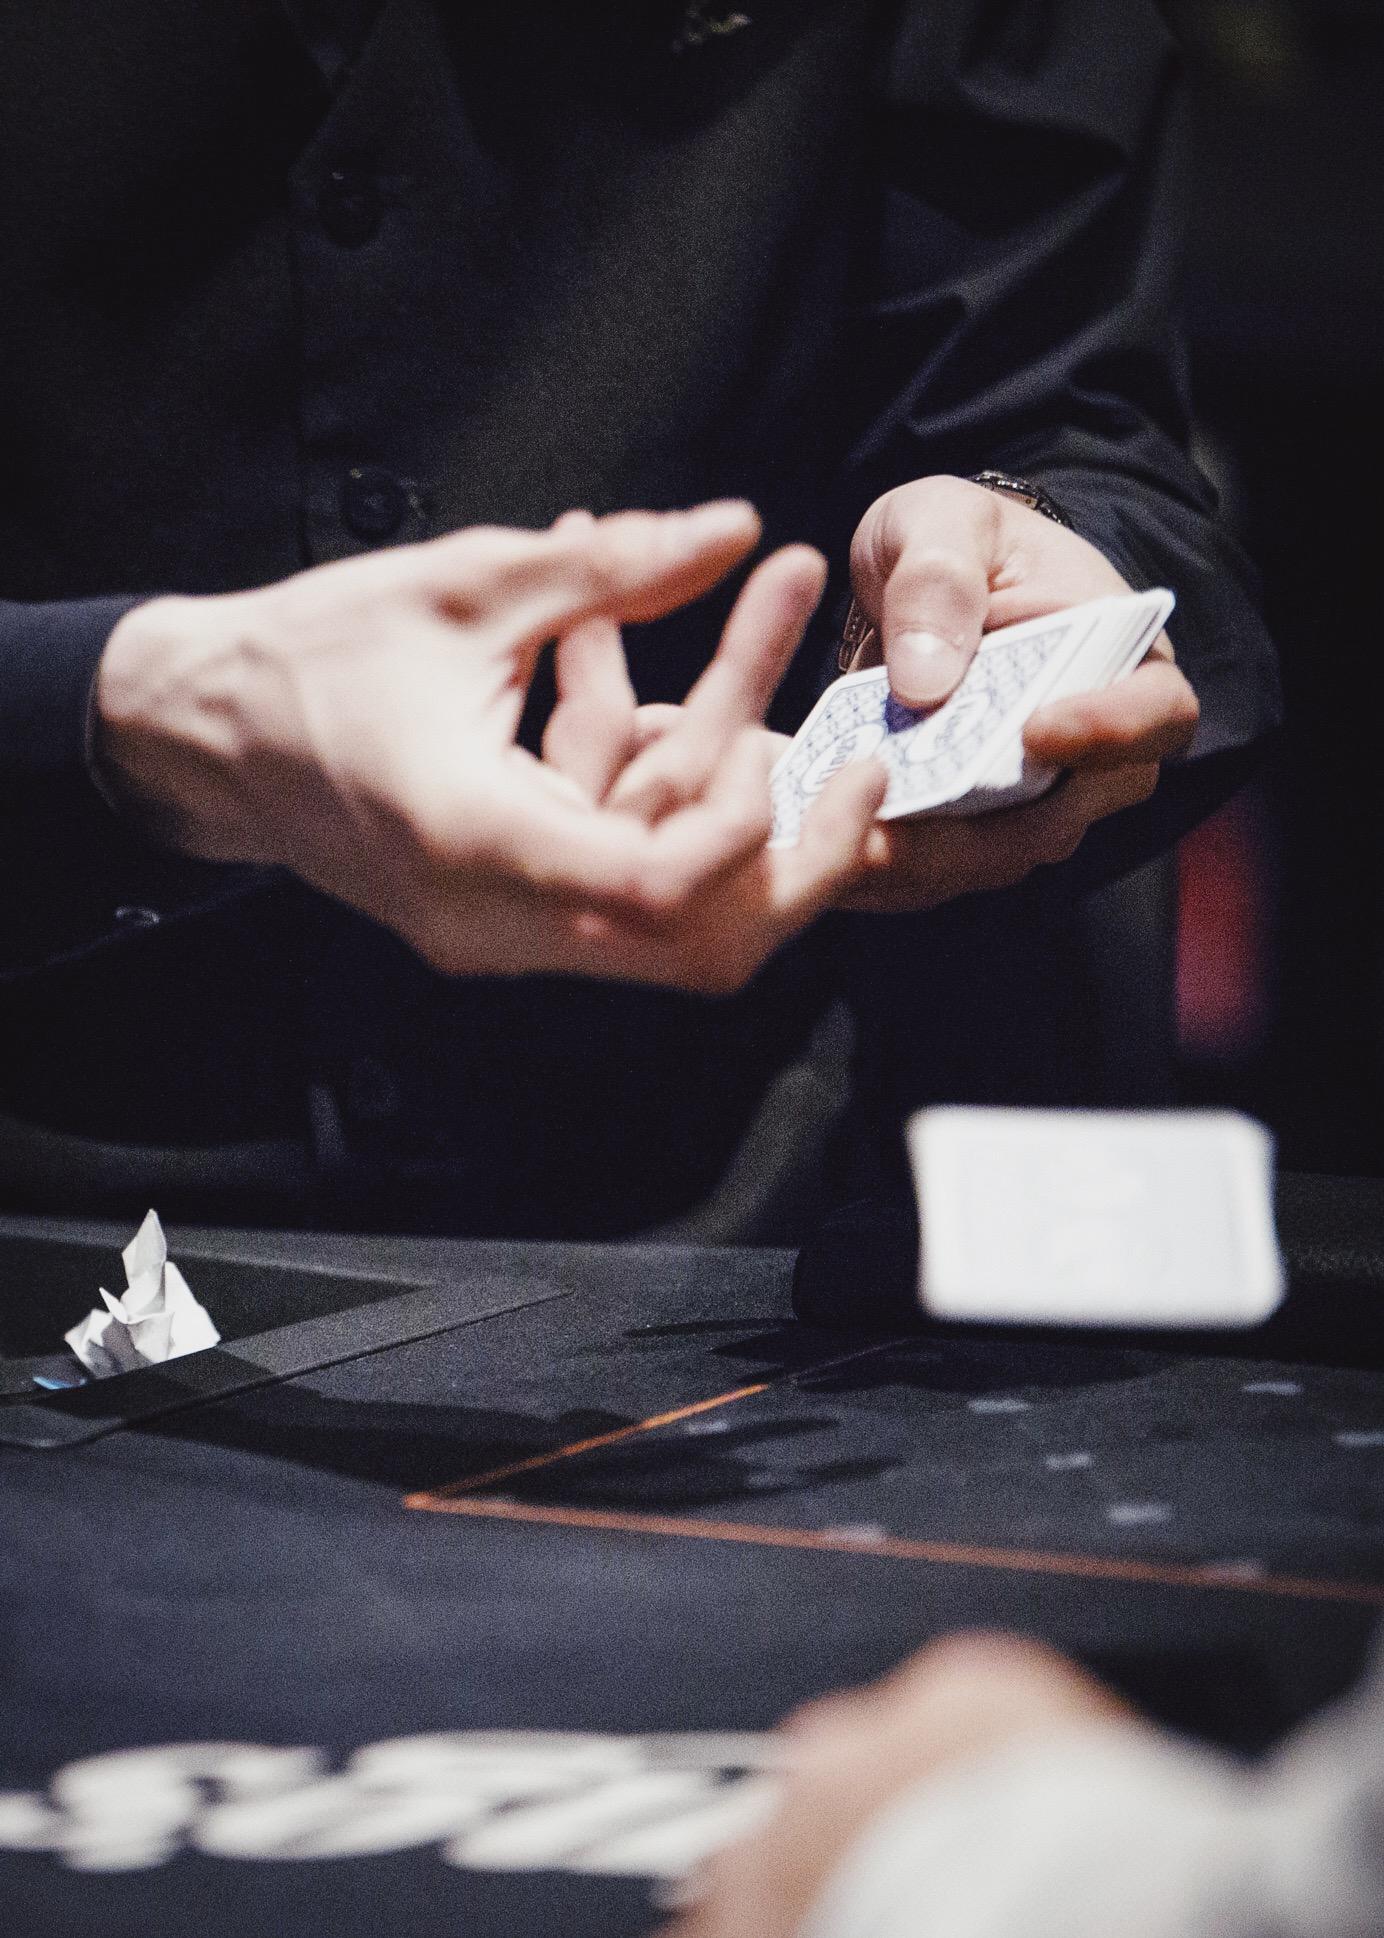 polina-shubkina-poker-019.JPG